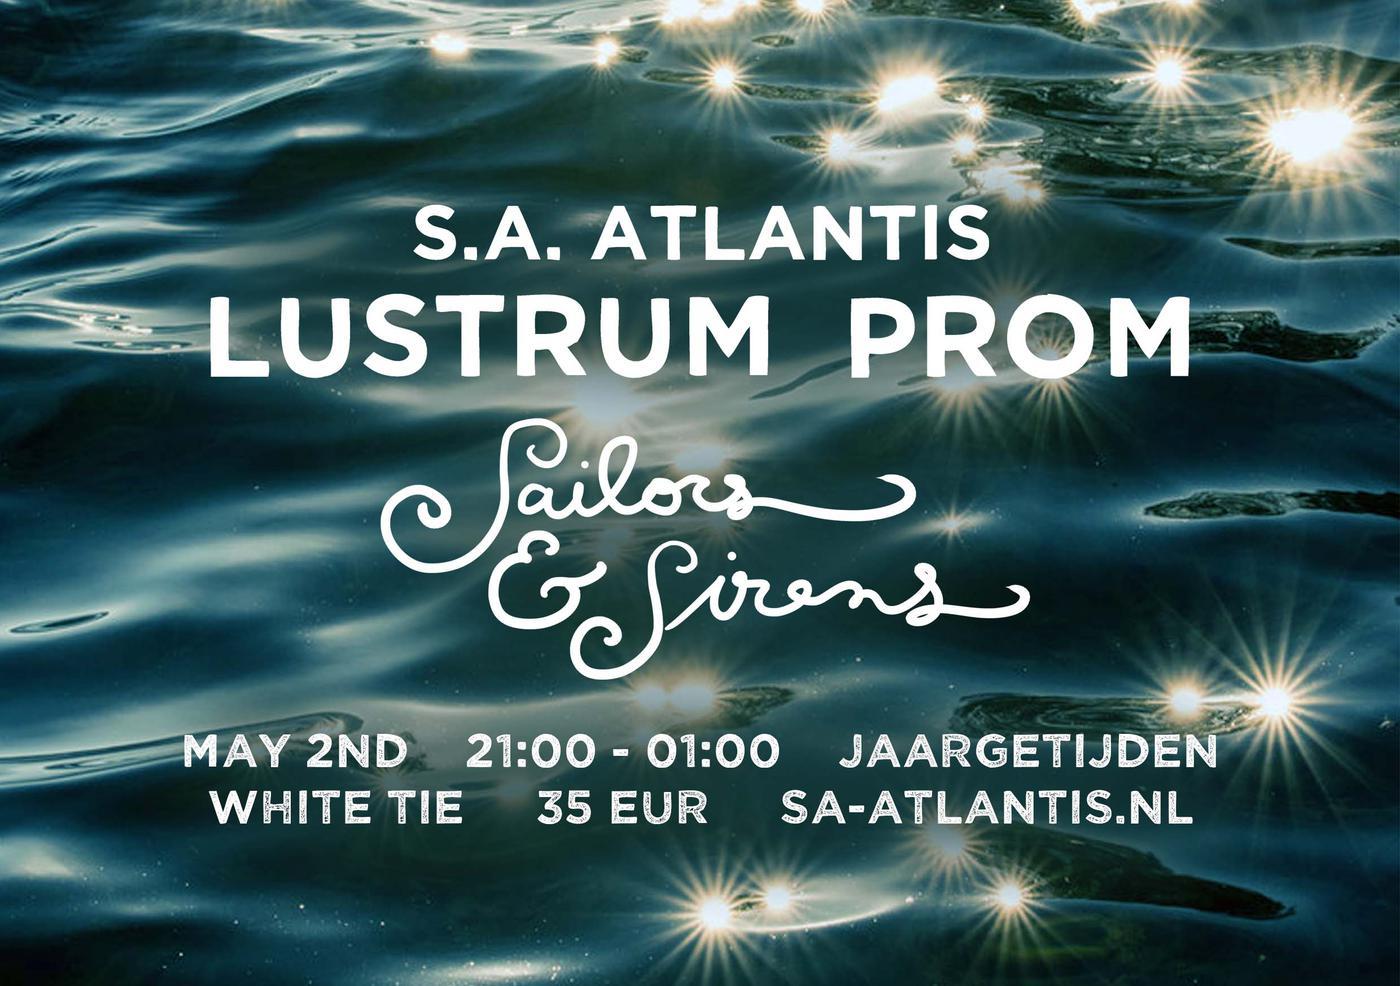 First Lustrum Gala